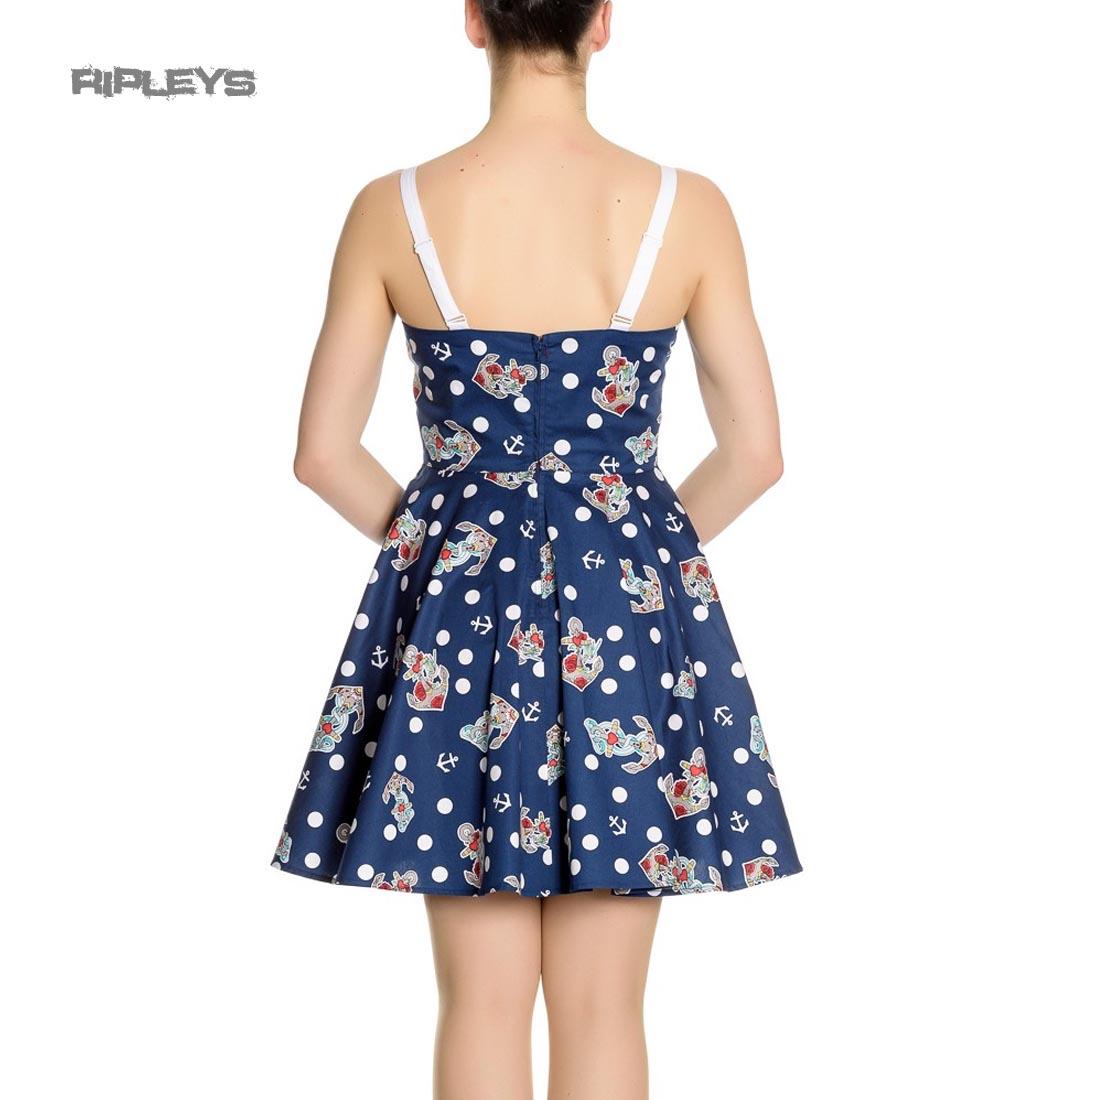 Hell-Bunny-Navy-Blue-50s-Nautical-Mini-Dress-OCEANA-Polka-Dot-All-Sizes thumbnail 16